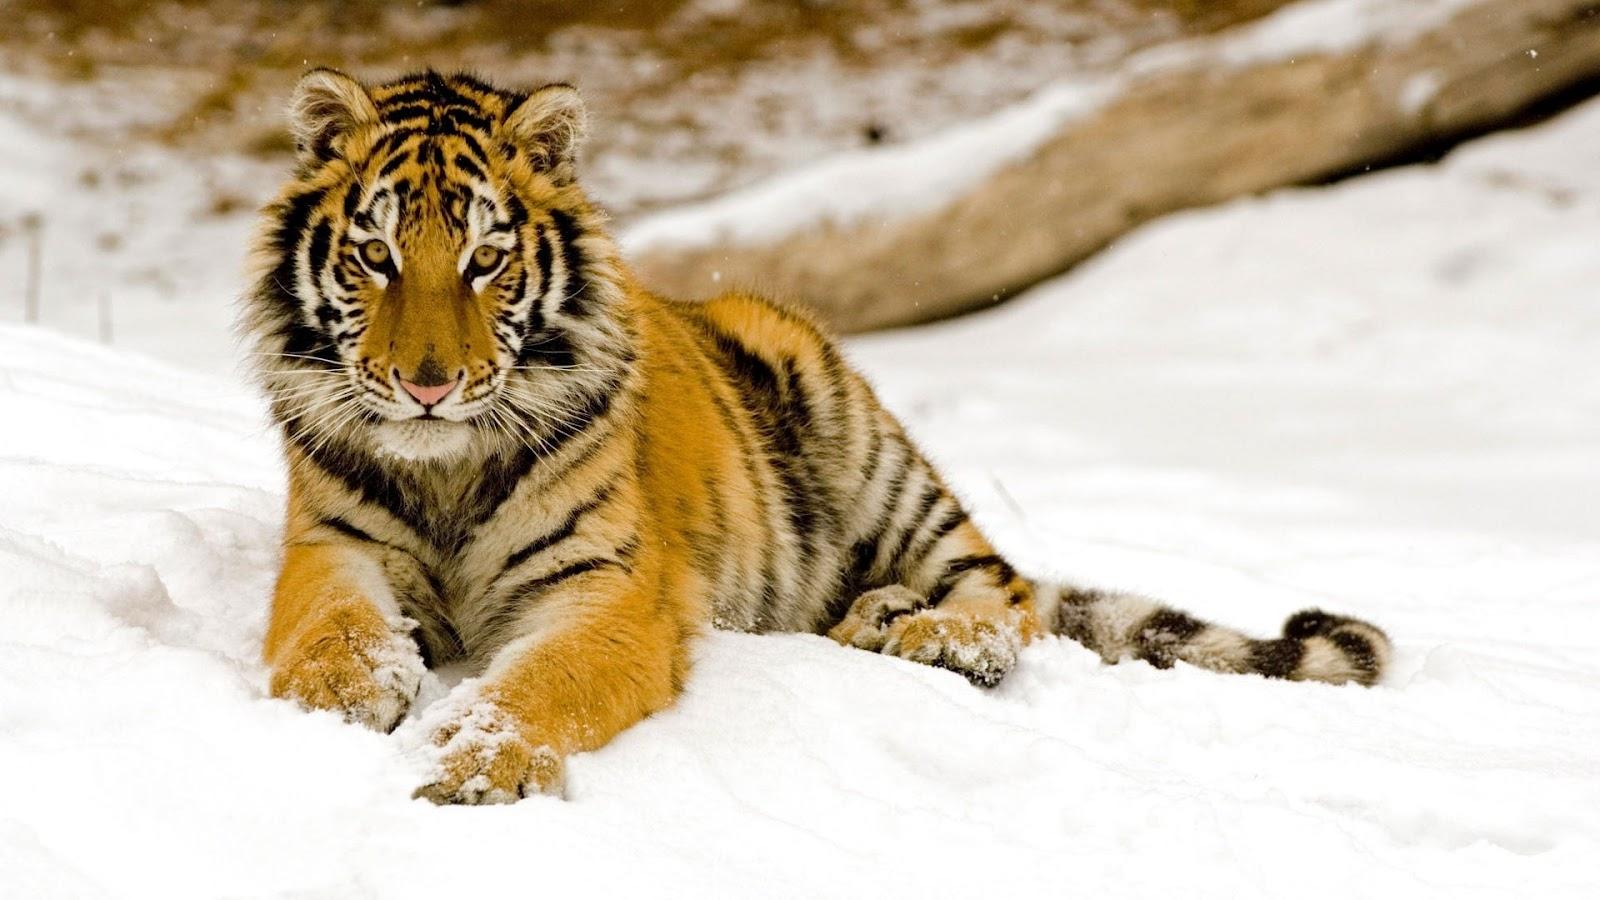 fotos de tigres en la nieve fotos e im genes en fotoblog x. Black Bedroom Furniture Sets. Home Design Ideas